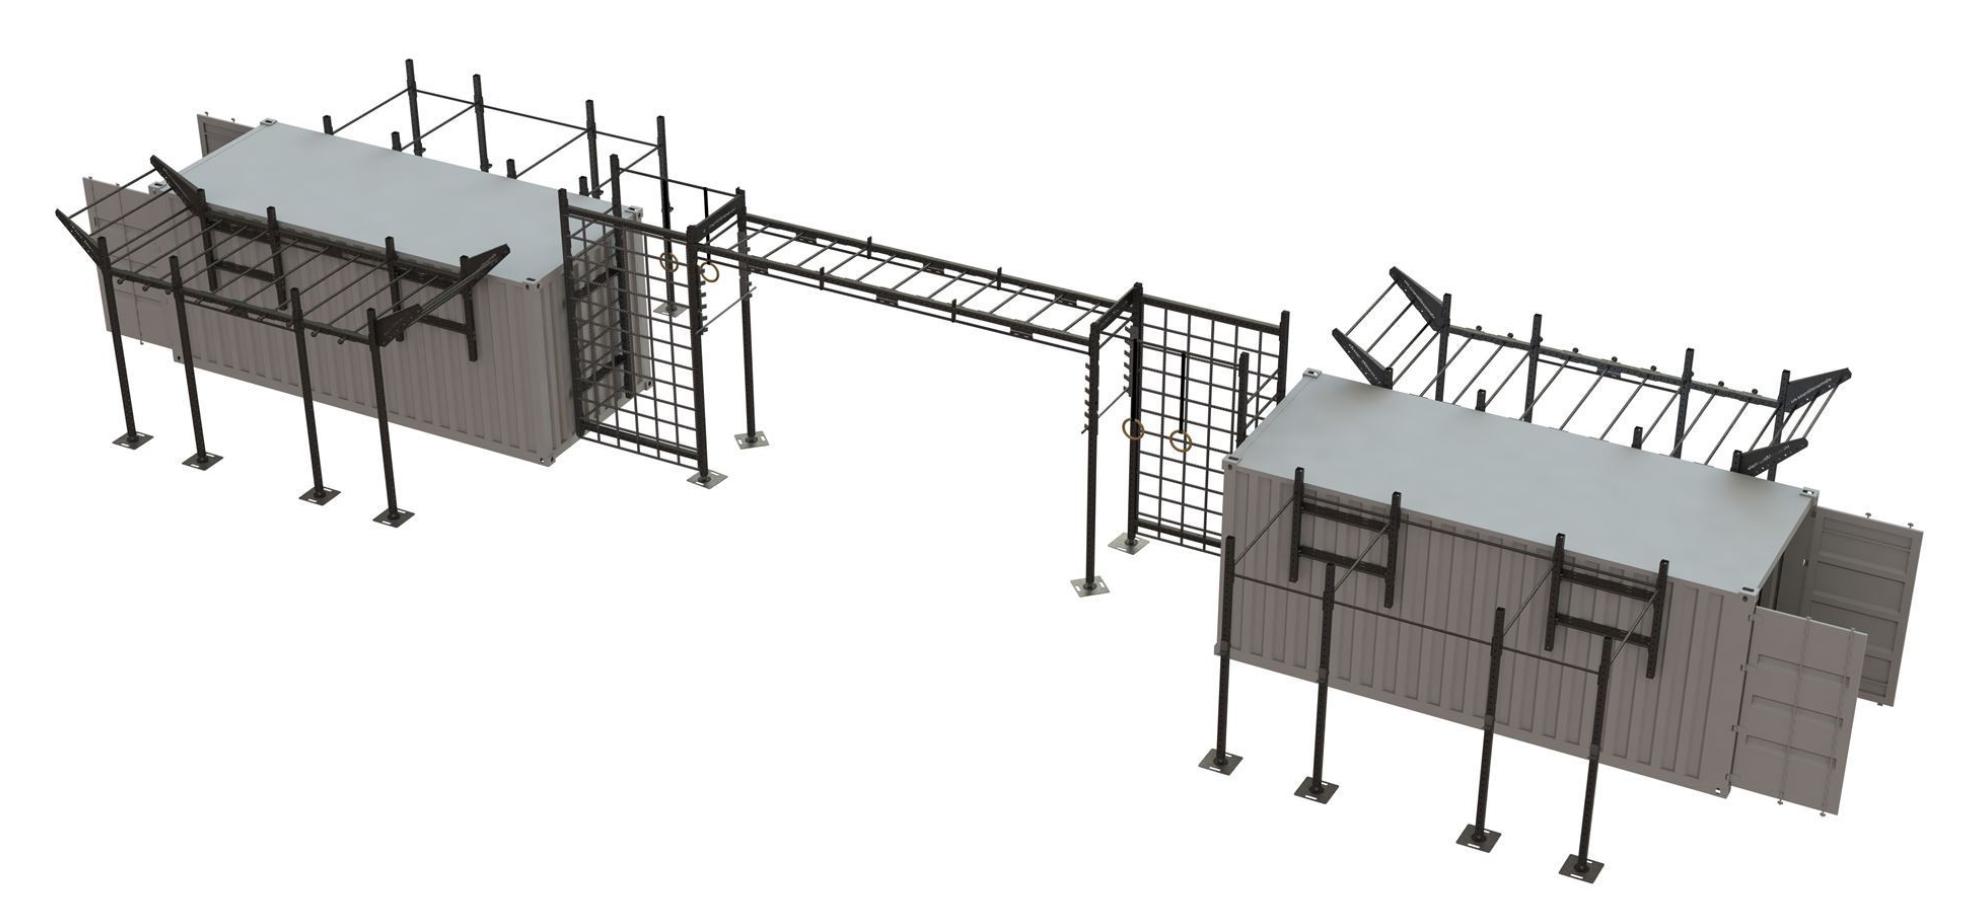 Anbaumo-glichkeit-Fitness-Outdoor-Container-Parkur